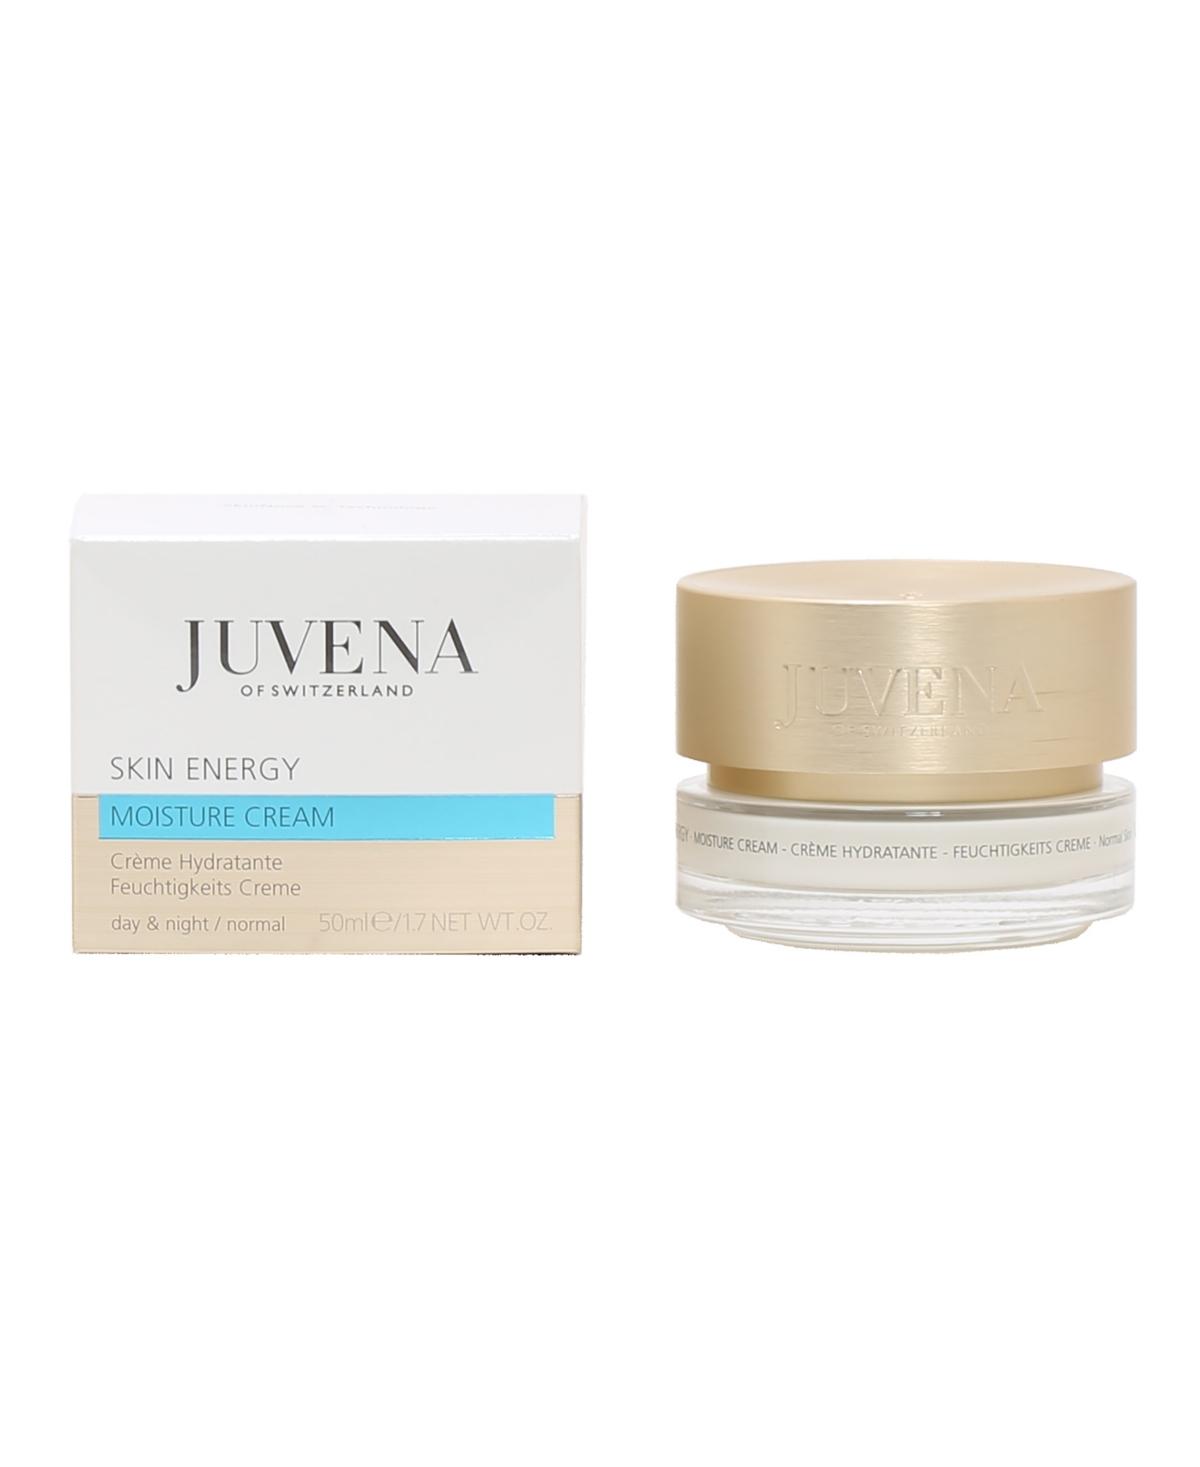 Juvena Skin Energy Moisture Cream Jar, 1.7 oz